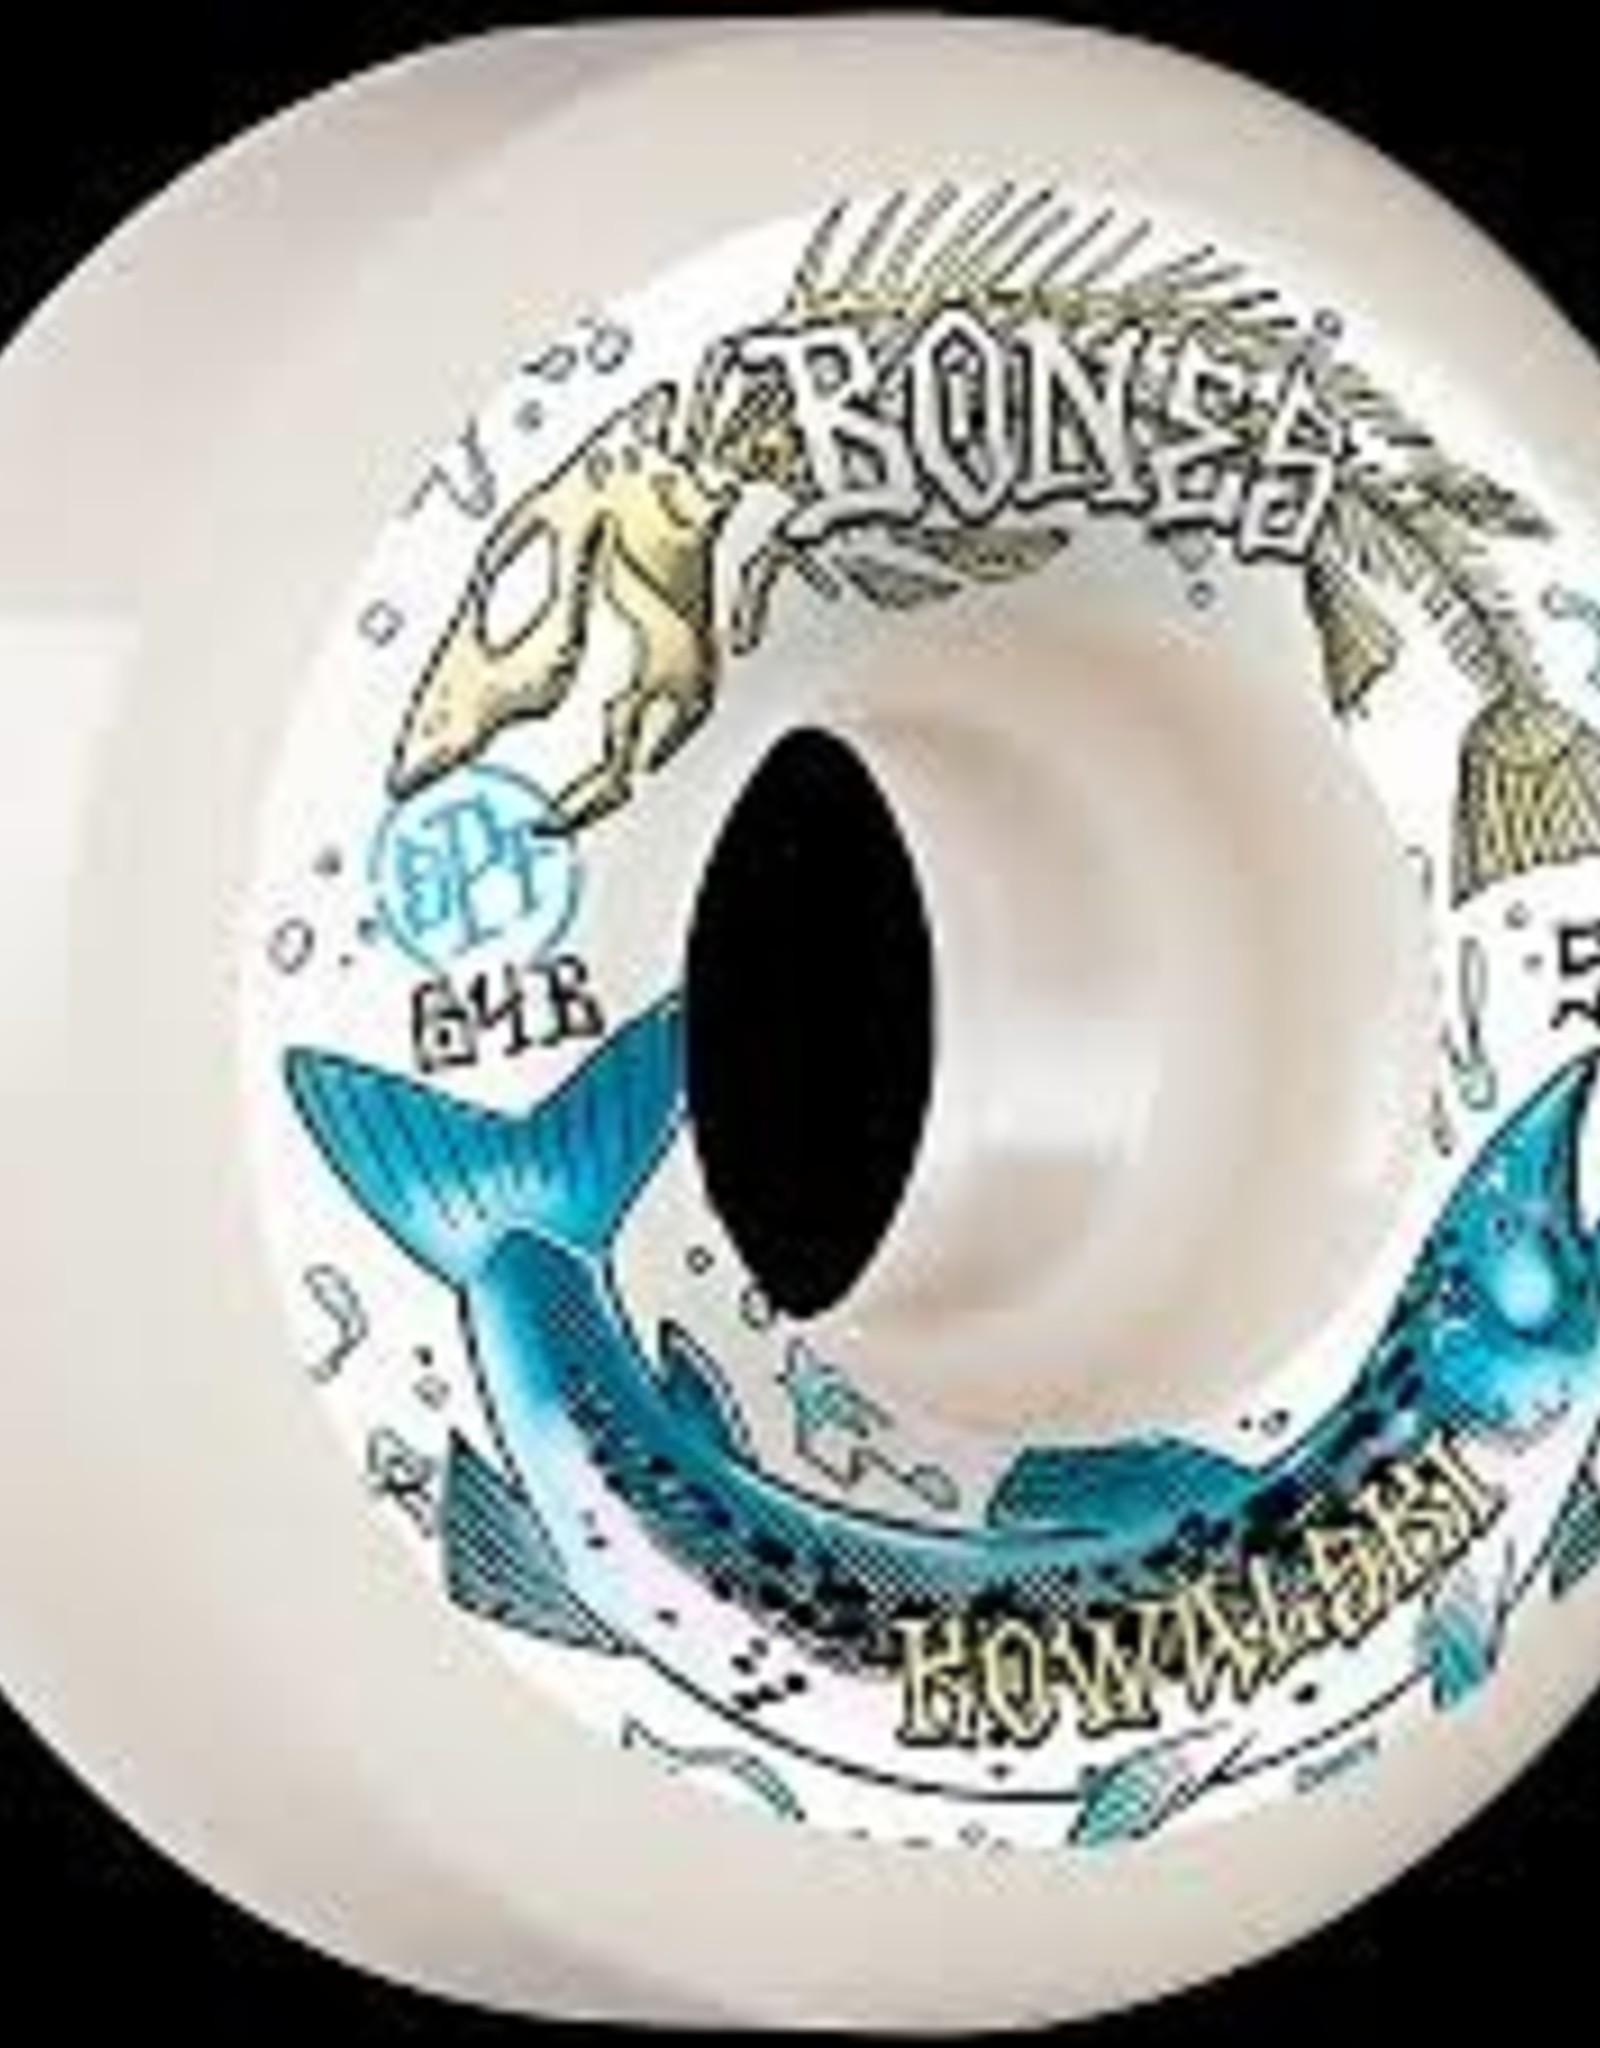 Bones BONES SPF WHEELS - KOWALSKI SALMON SPAWN 84B (54)